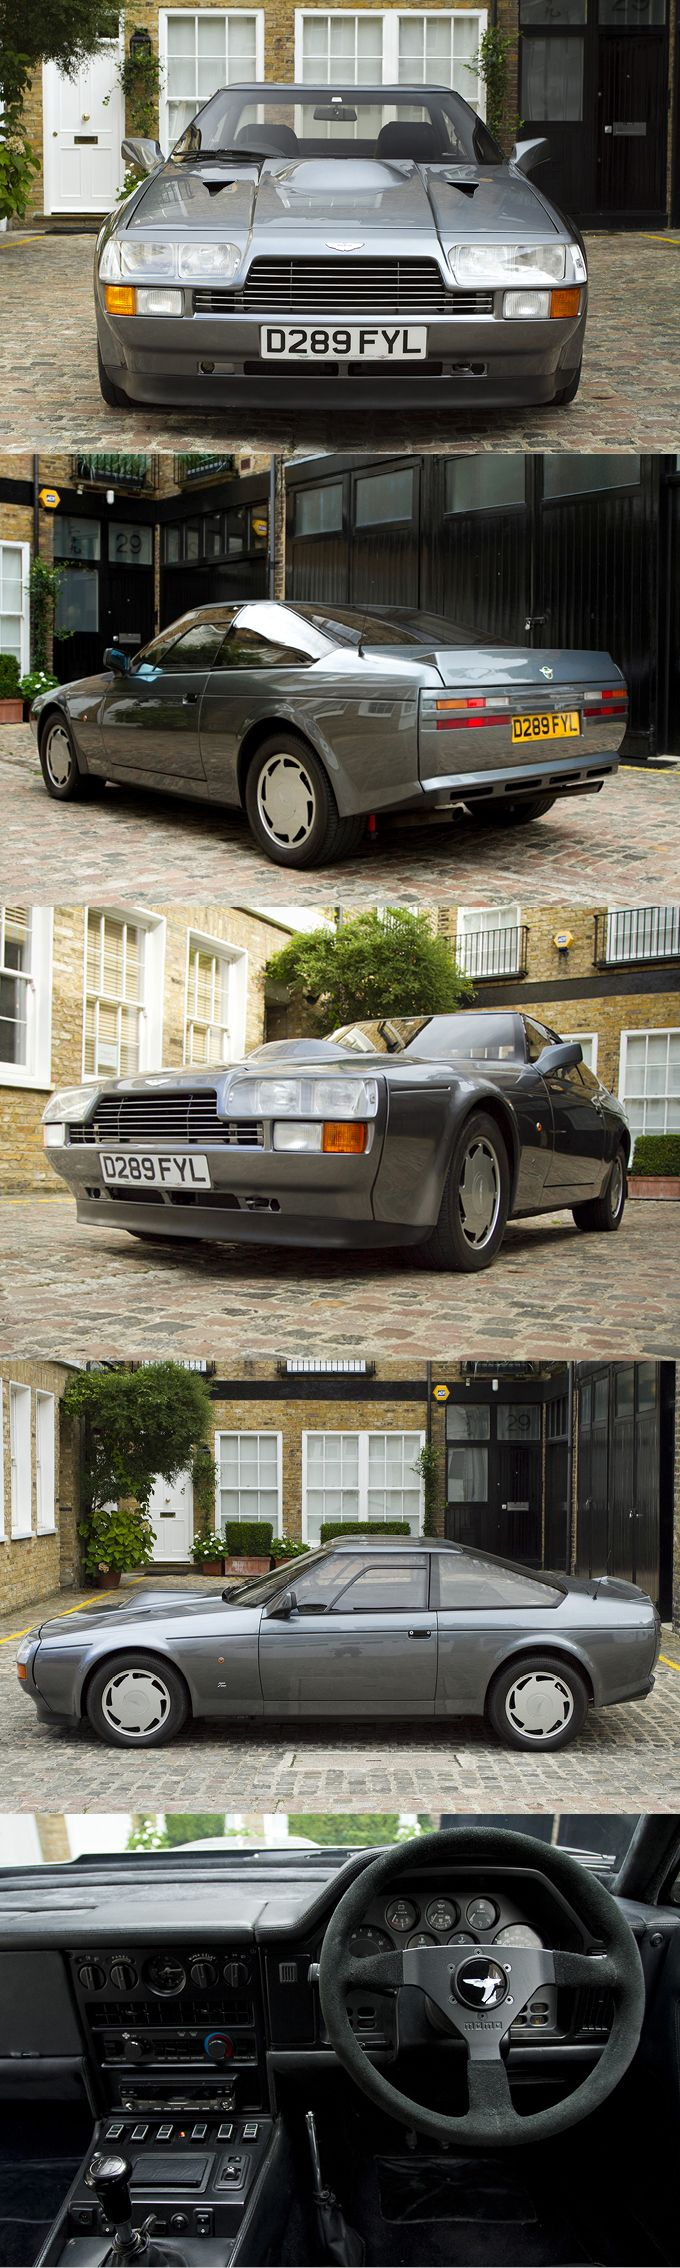 1986 Aston Martin V8 Vantage Zagato / 430hp 5.3l V8 / Hexagoncalssics / 89 produced / grey / UK / 17-359